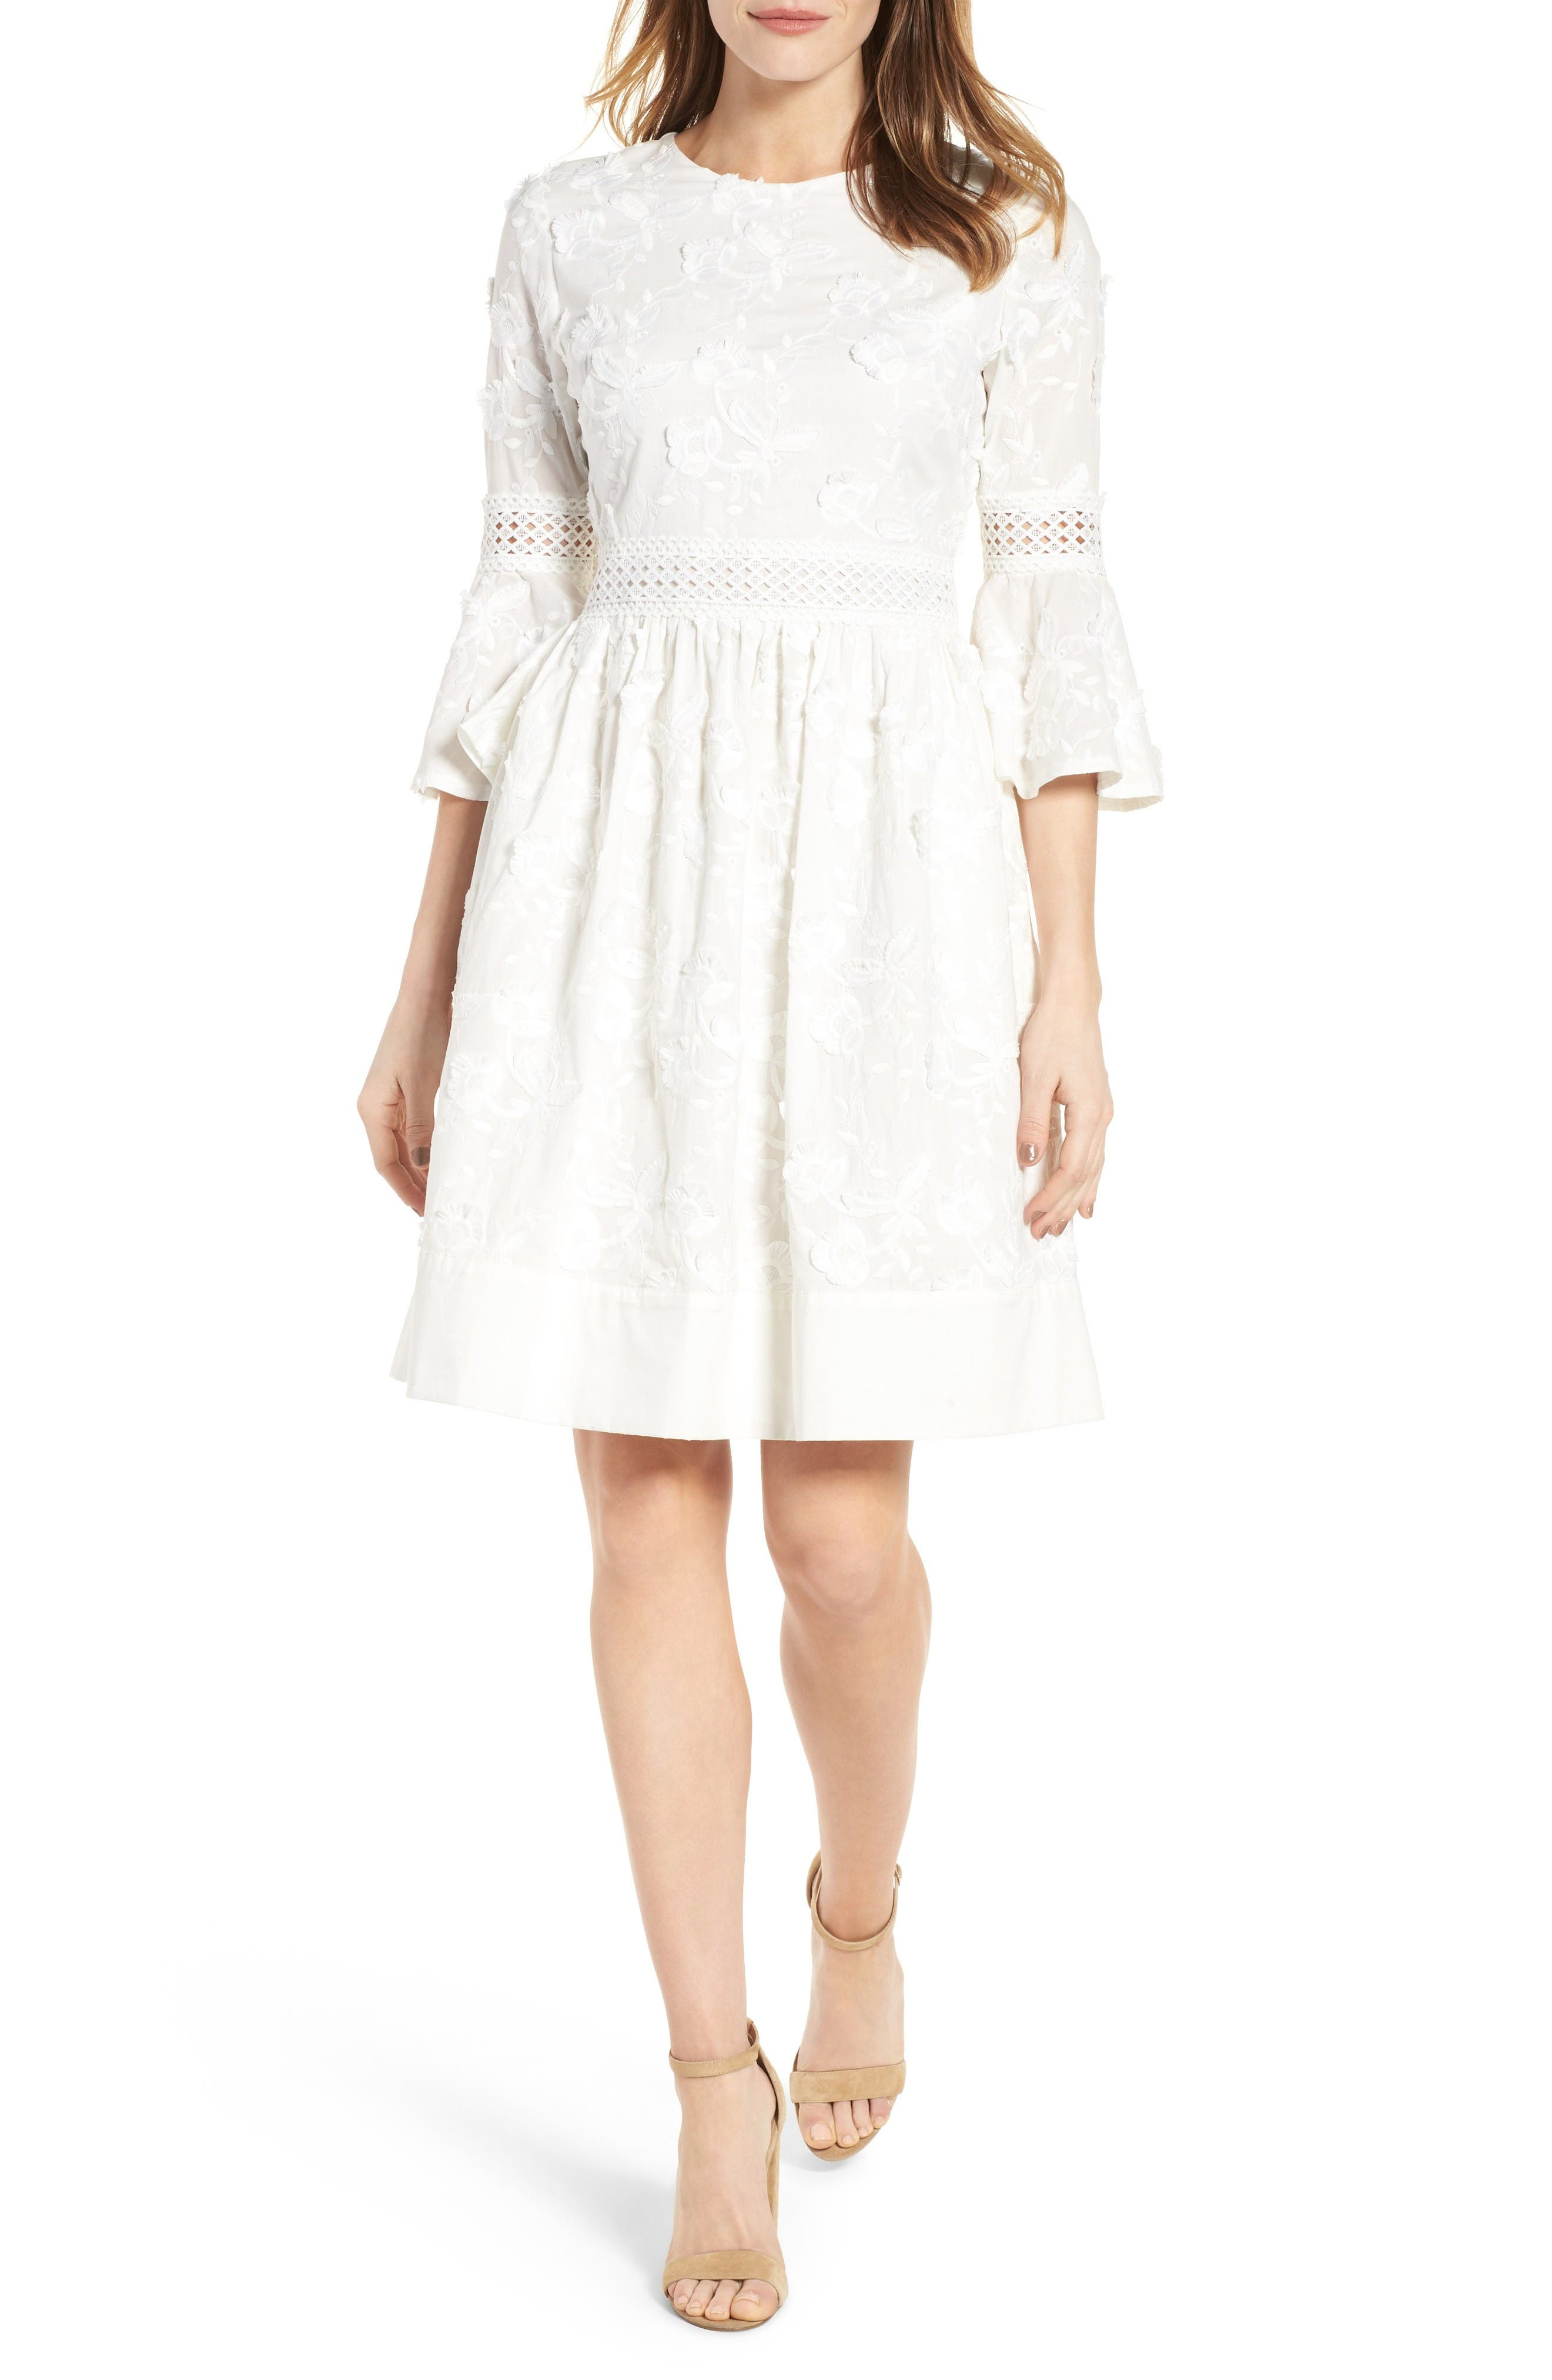 Alternate Image 1 Selected - Eliza J Fit & Flare Dress (Regular & Petite)